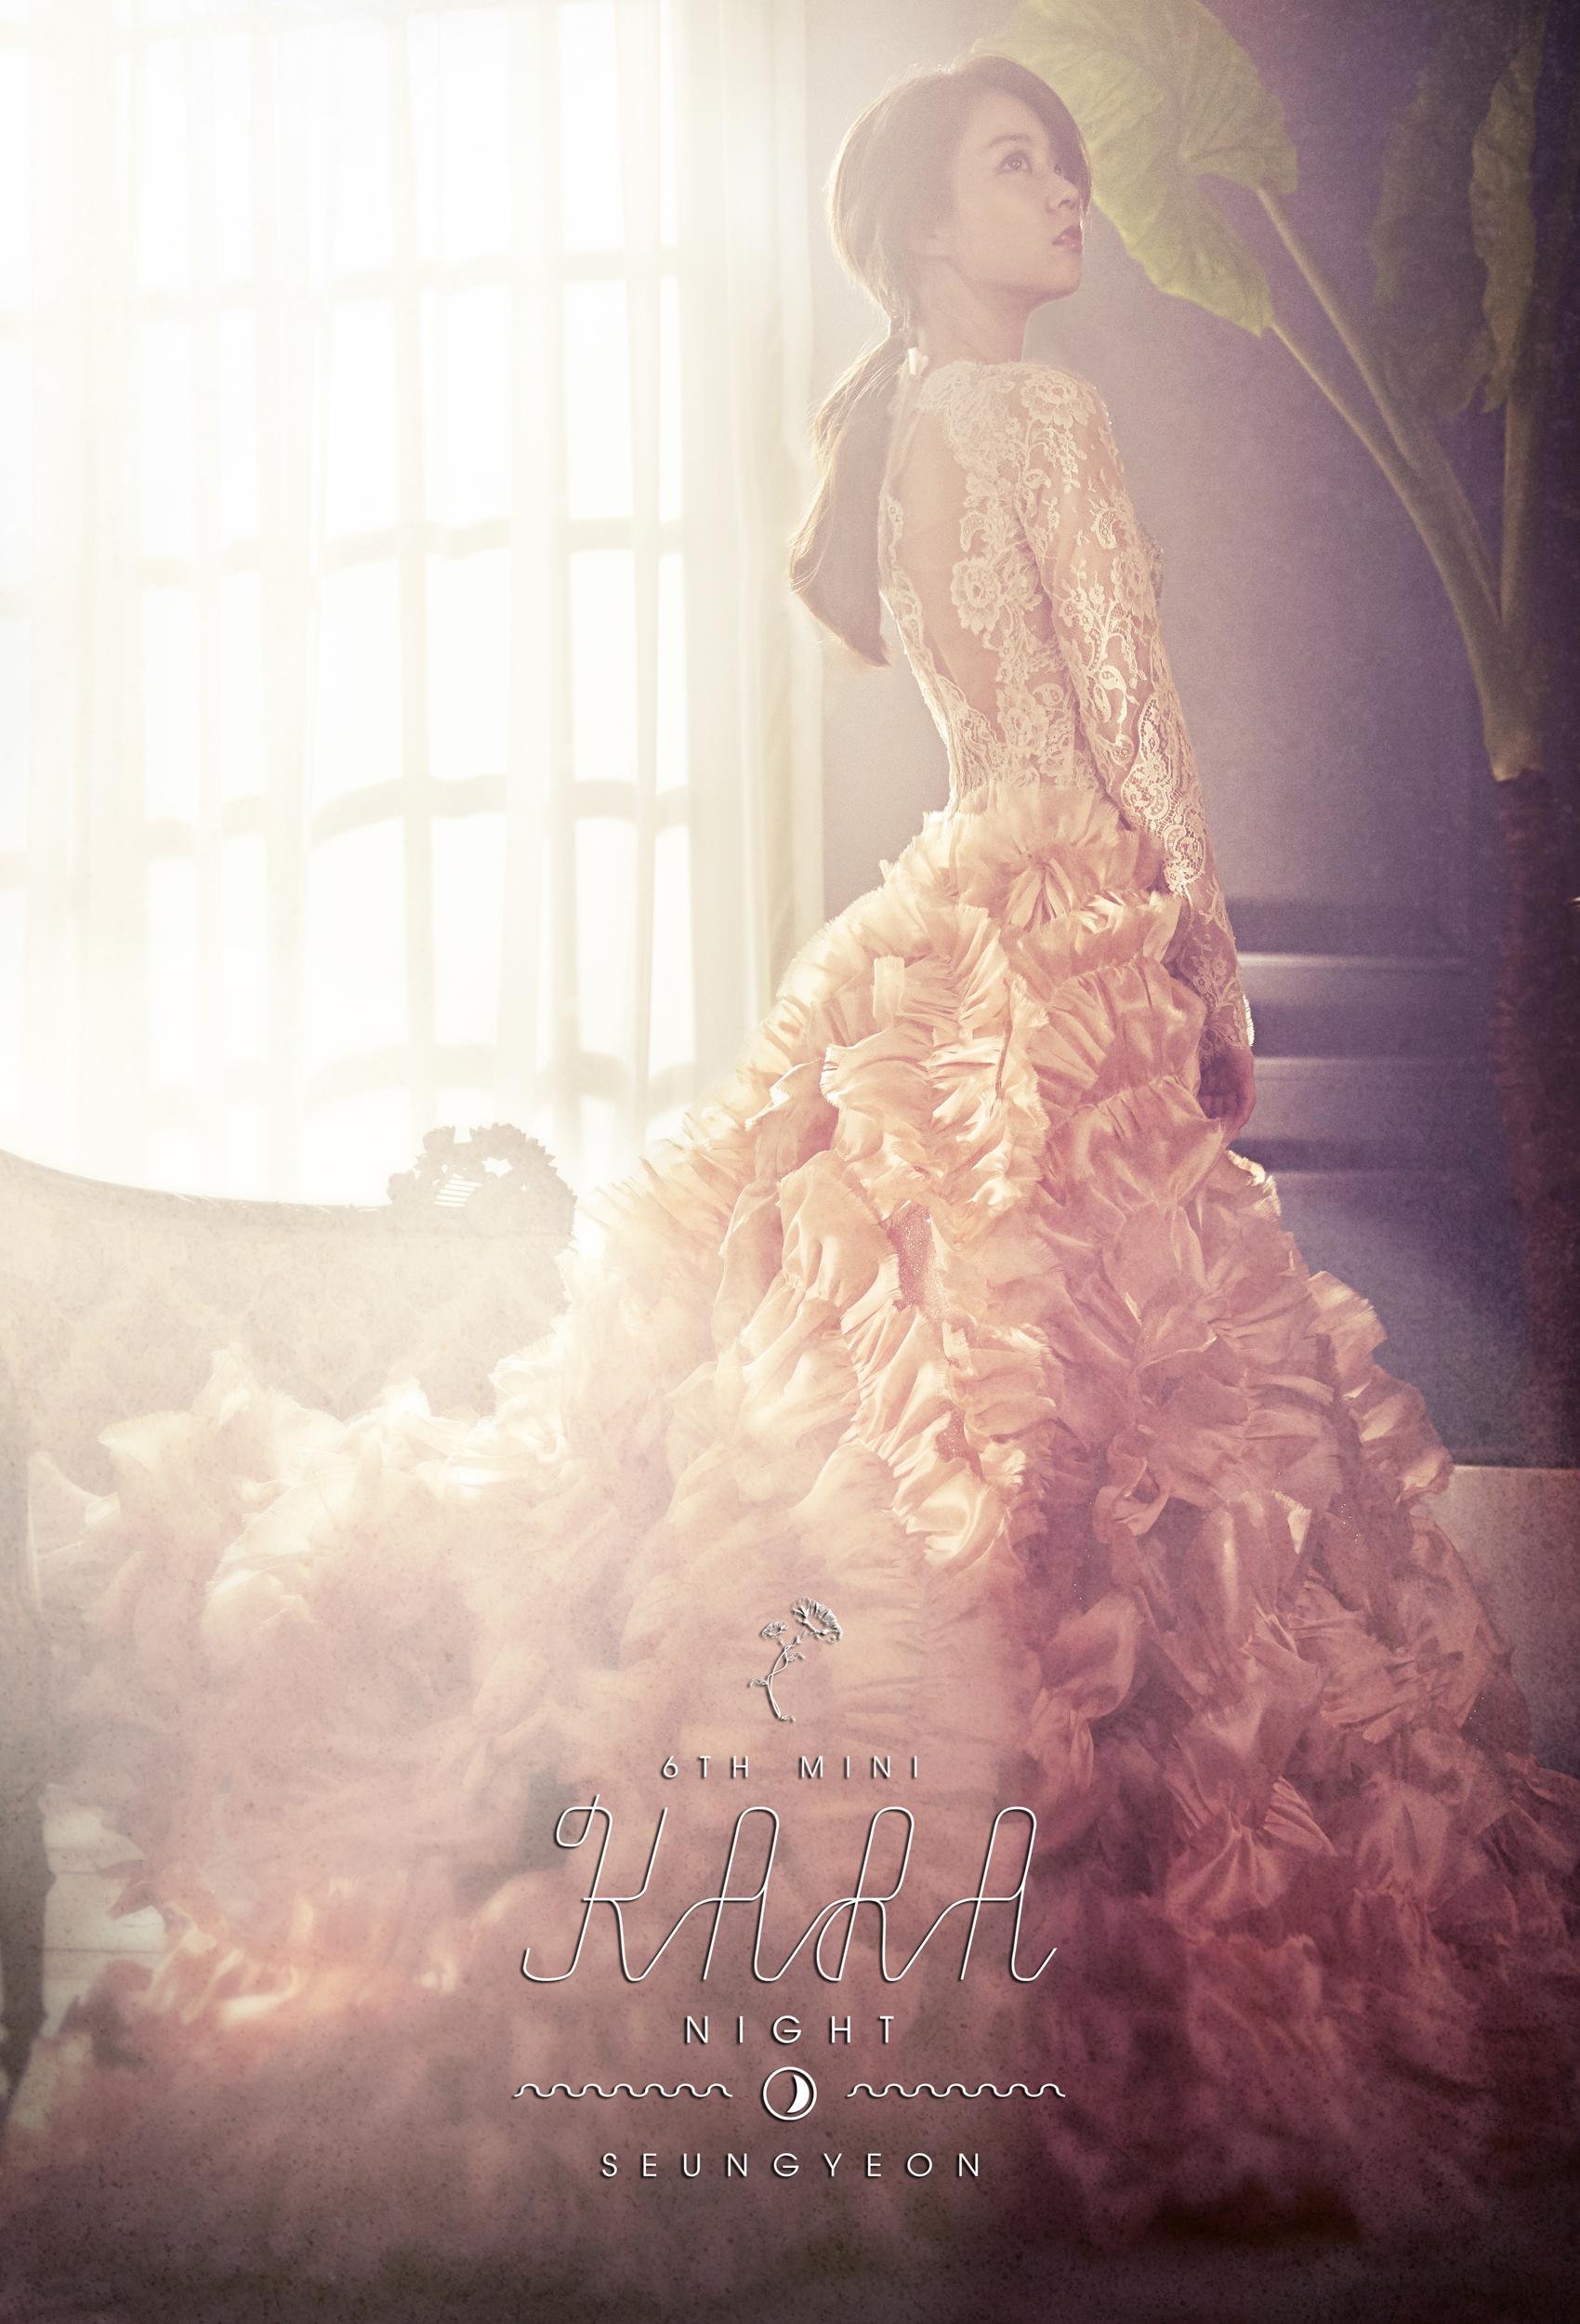 KARA Seungyeon 'Day & Night' Teaser 2 HQ